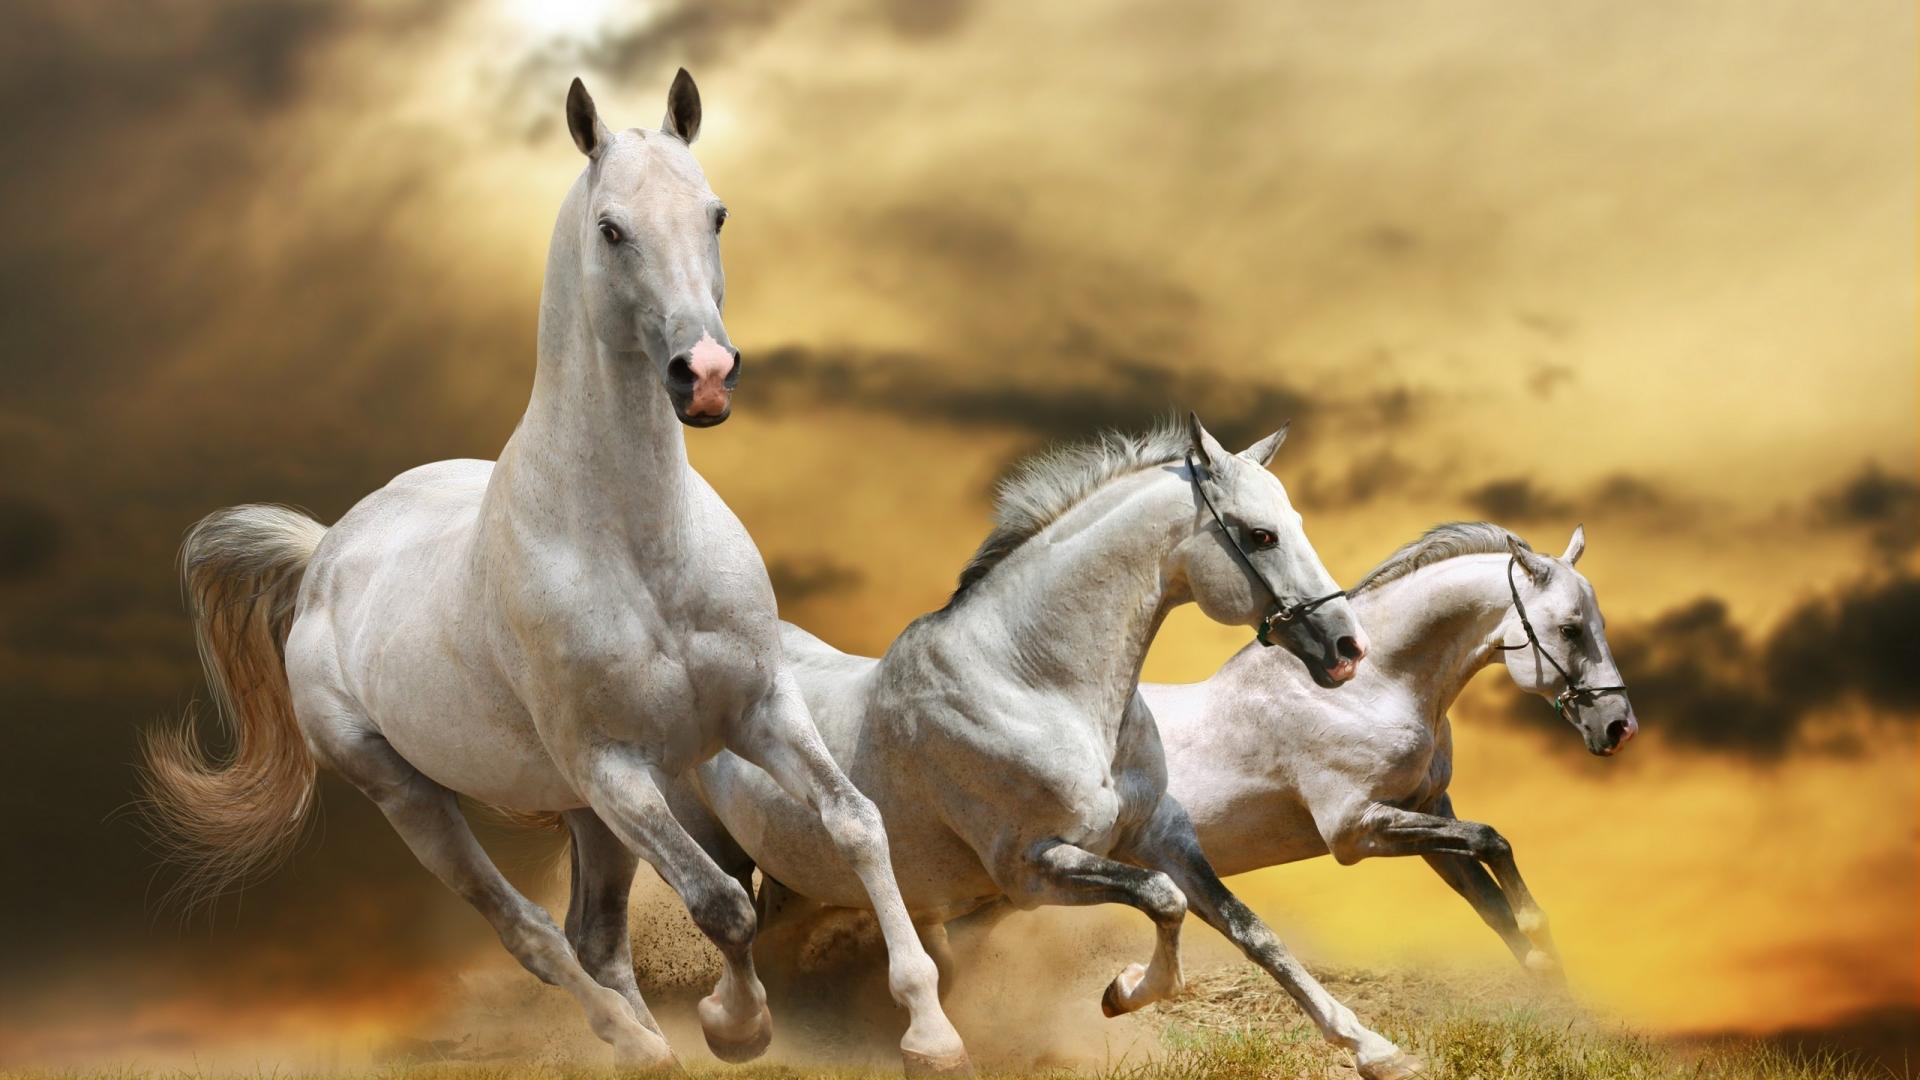 Coffee And Cars >> Three beautiful white horses running